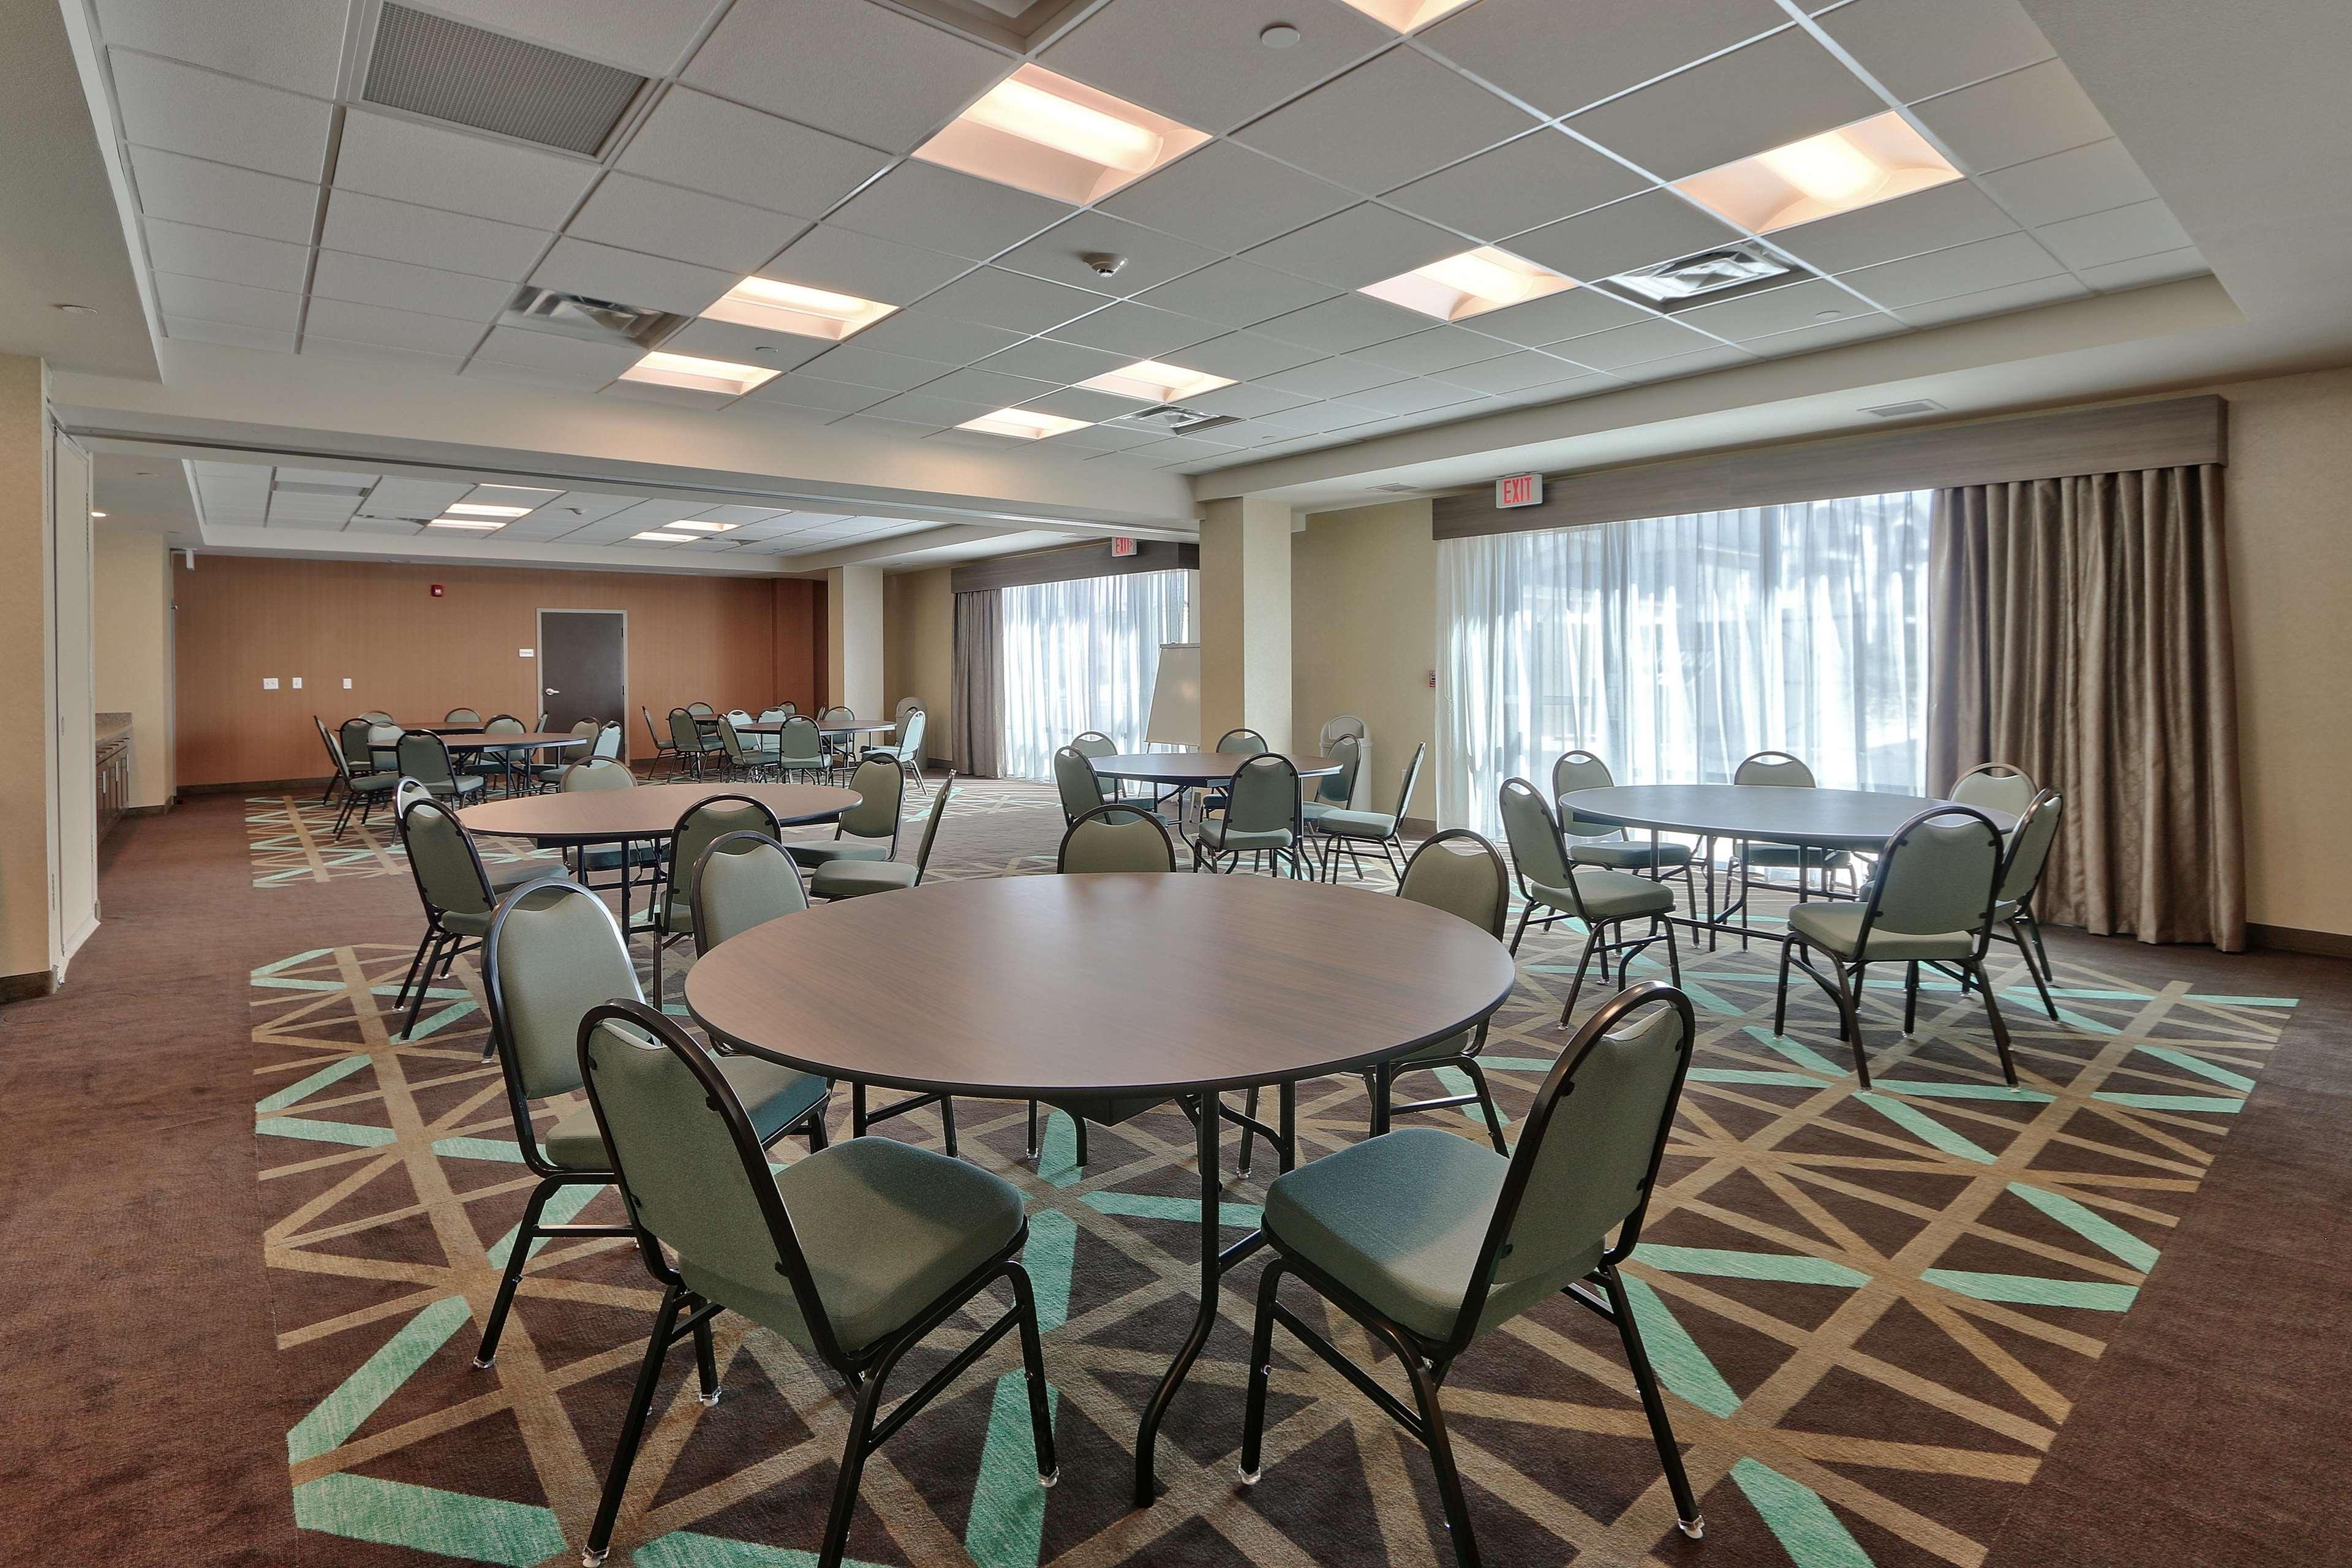 Hampton Inn & Suites Artesia image 26